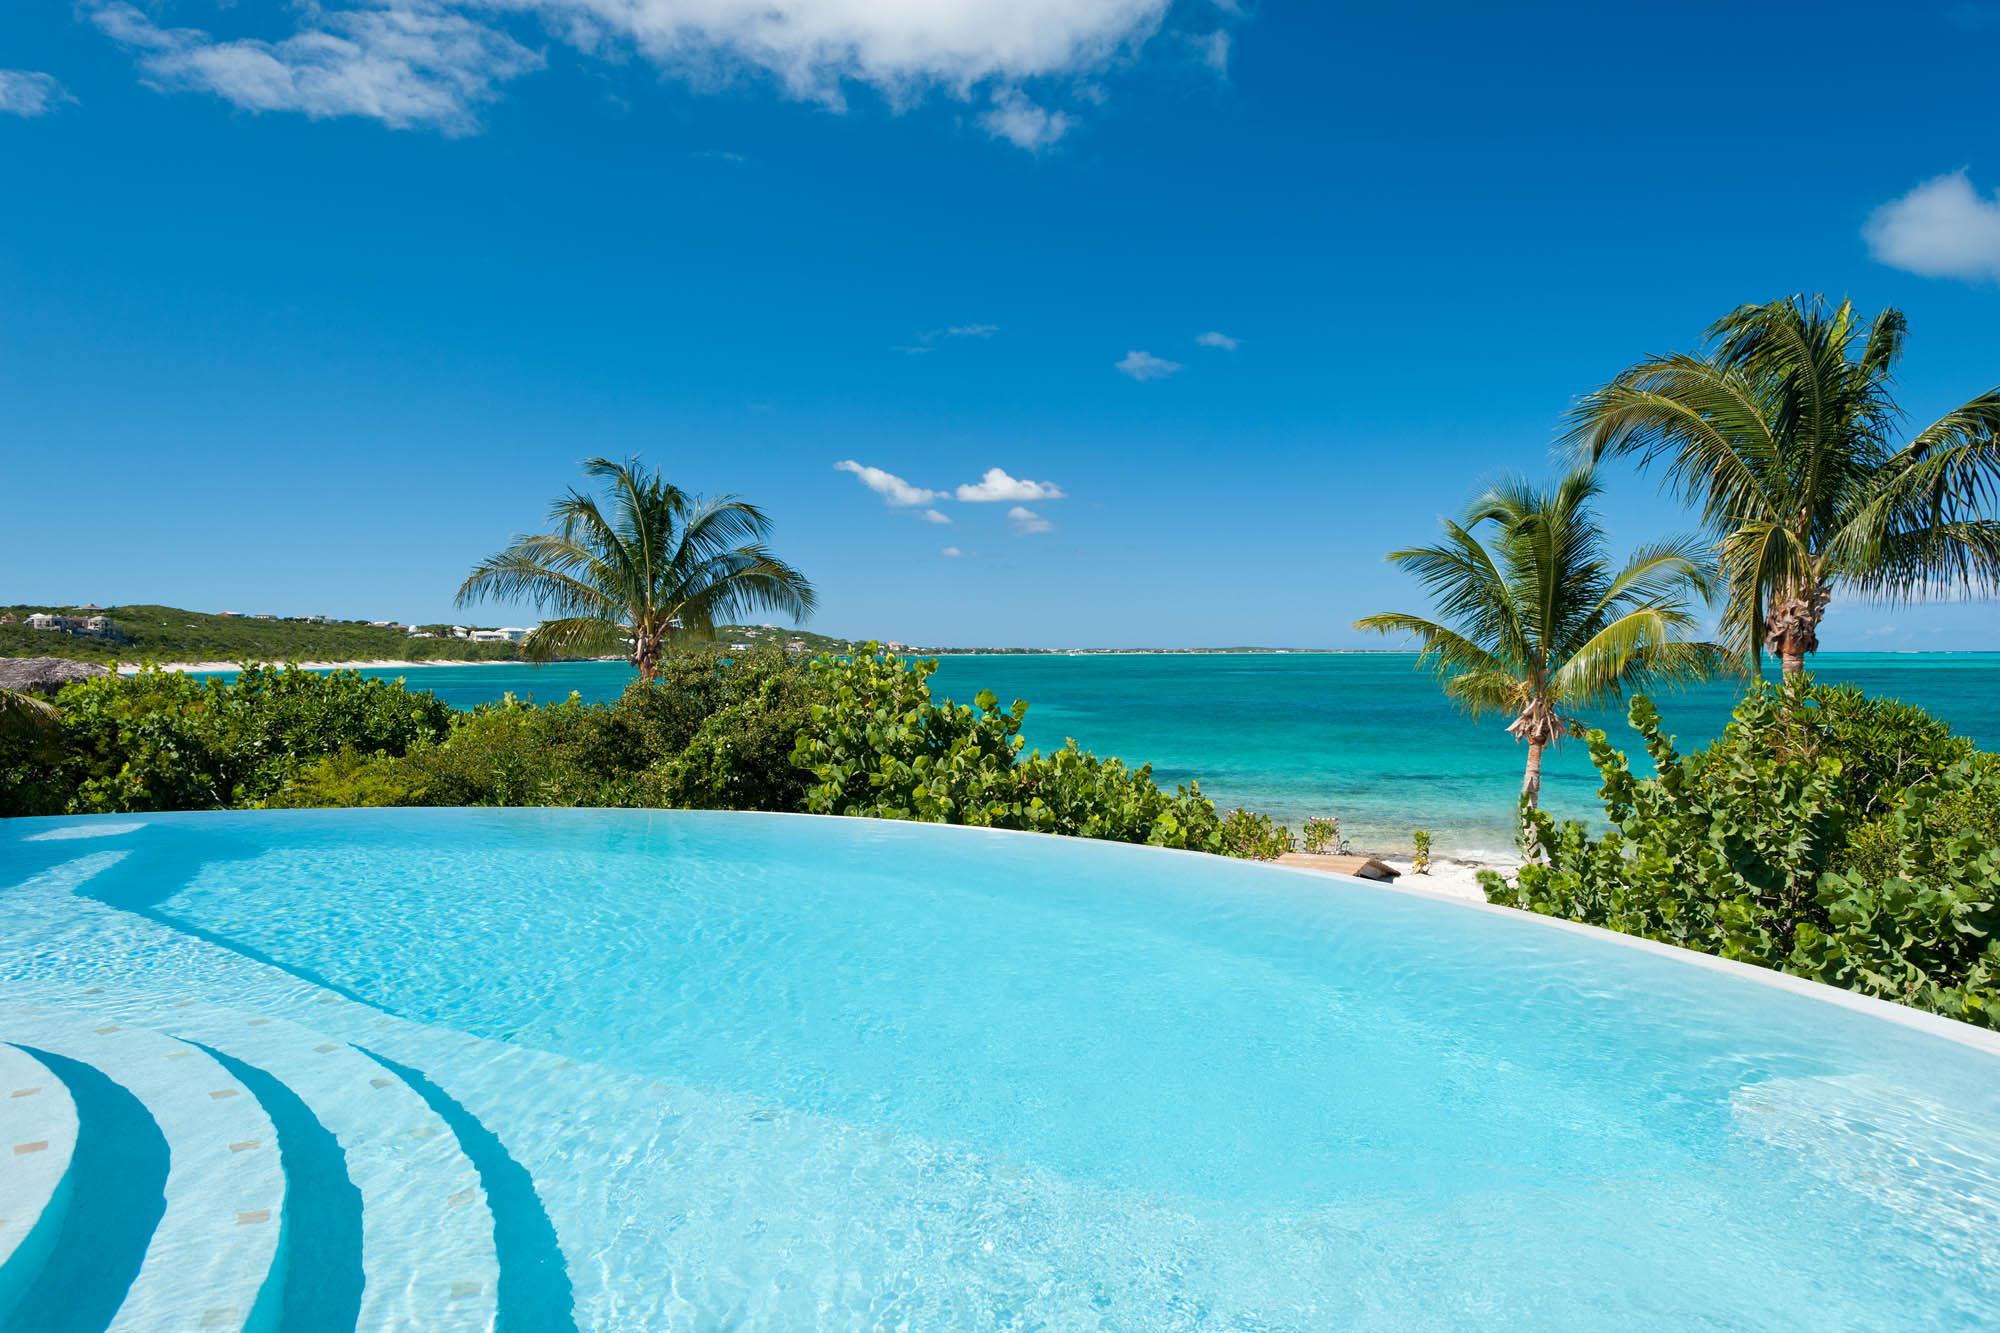 Villa Rent Feet In The Water